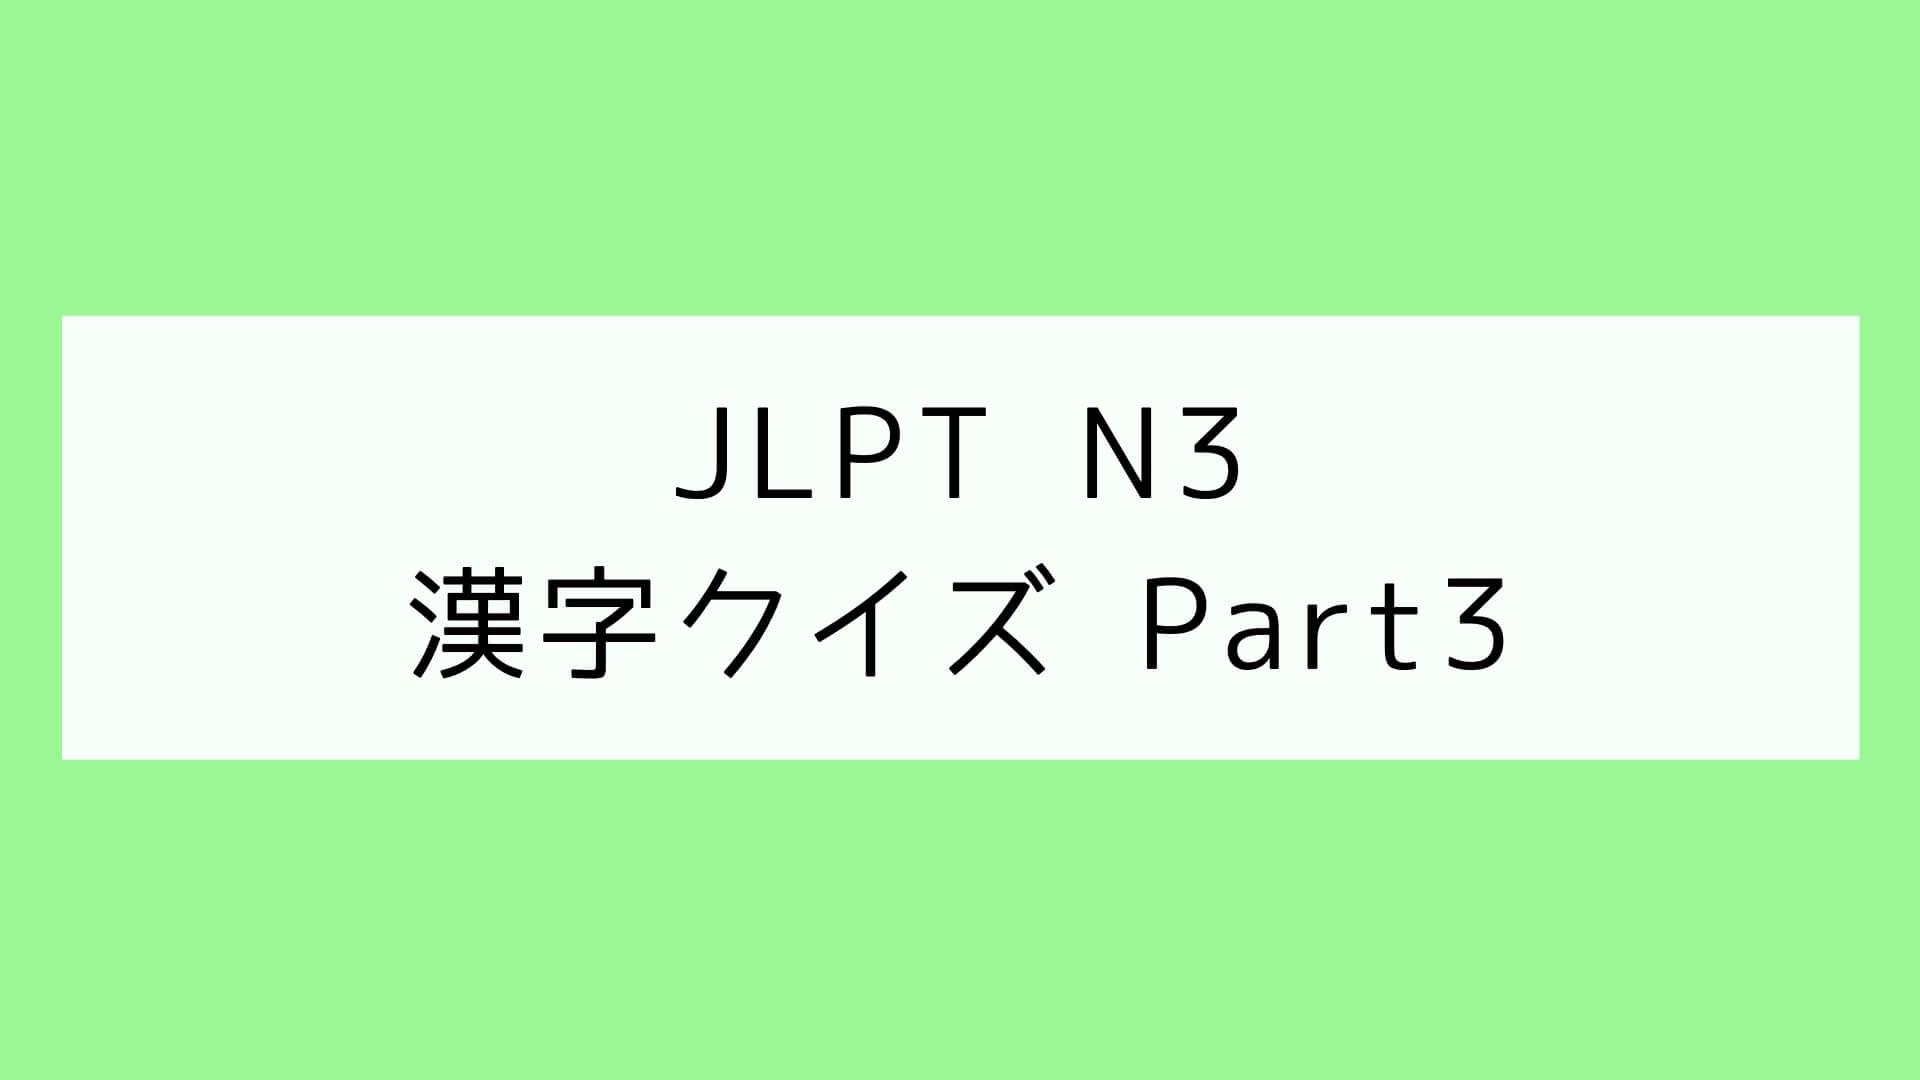 【JLPT N3】漢字クイズ Part3